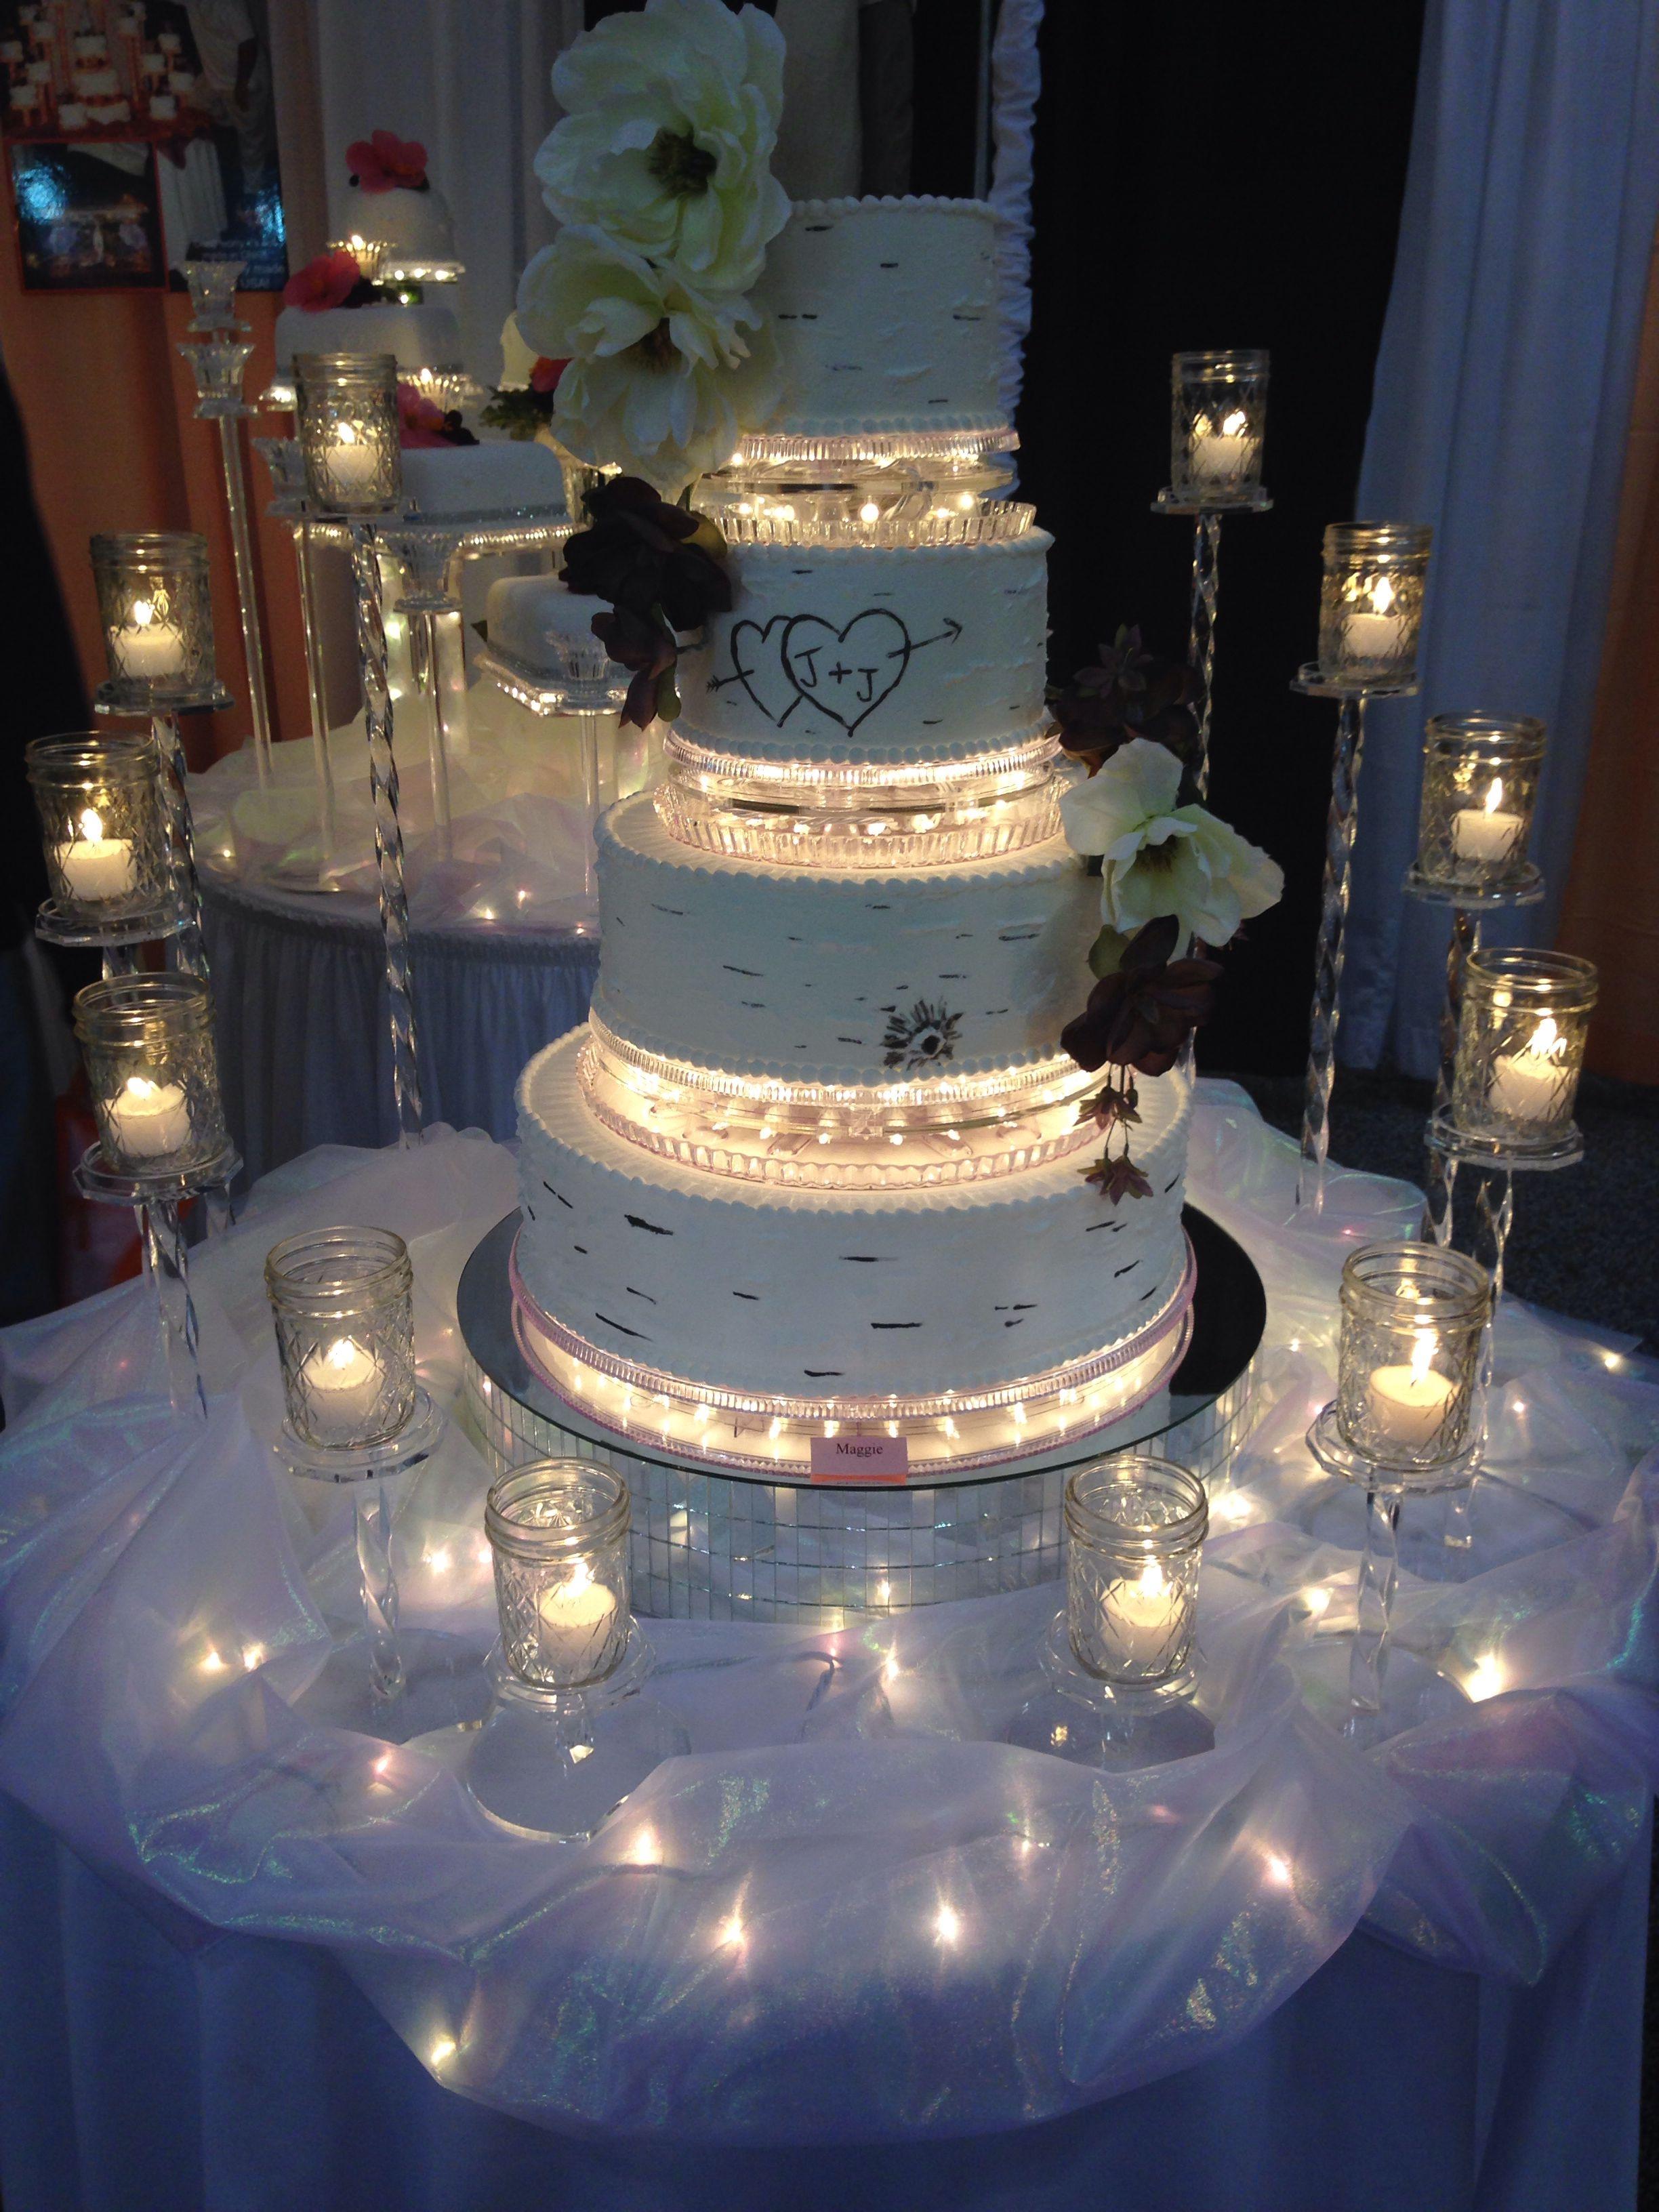 This Is Soo Cool Weddingcake Lights Baking Wedding Cake Table Wedding Cake Stands Wedding Desserts